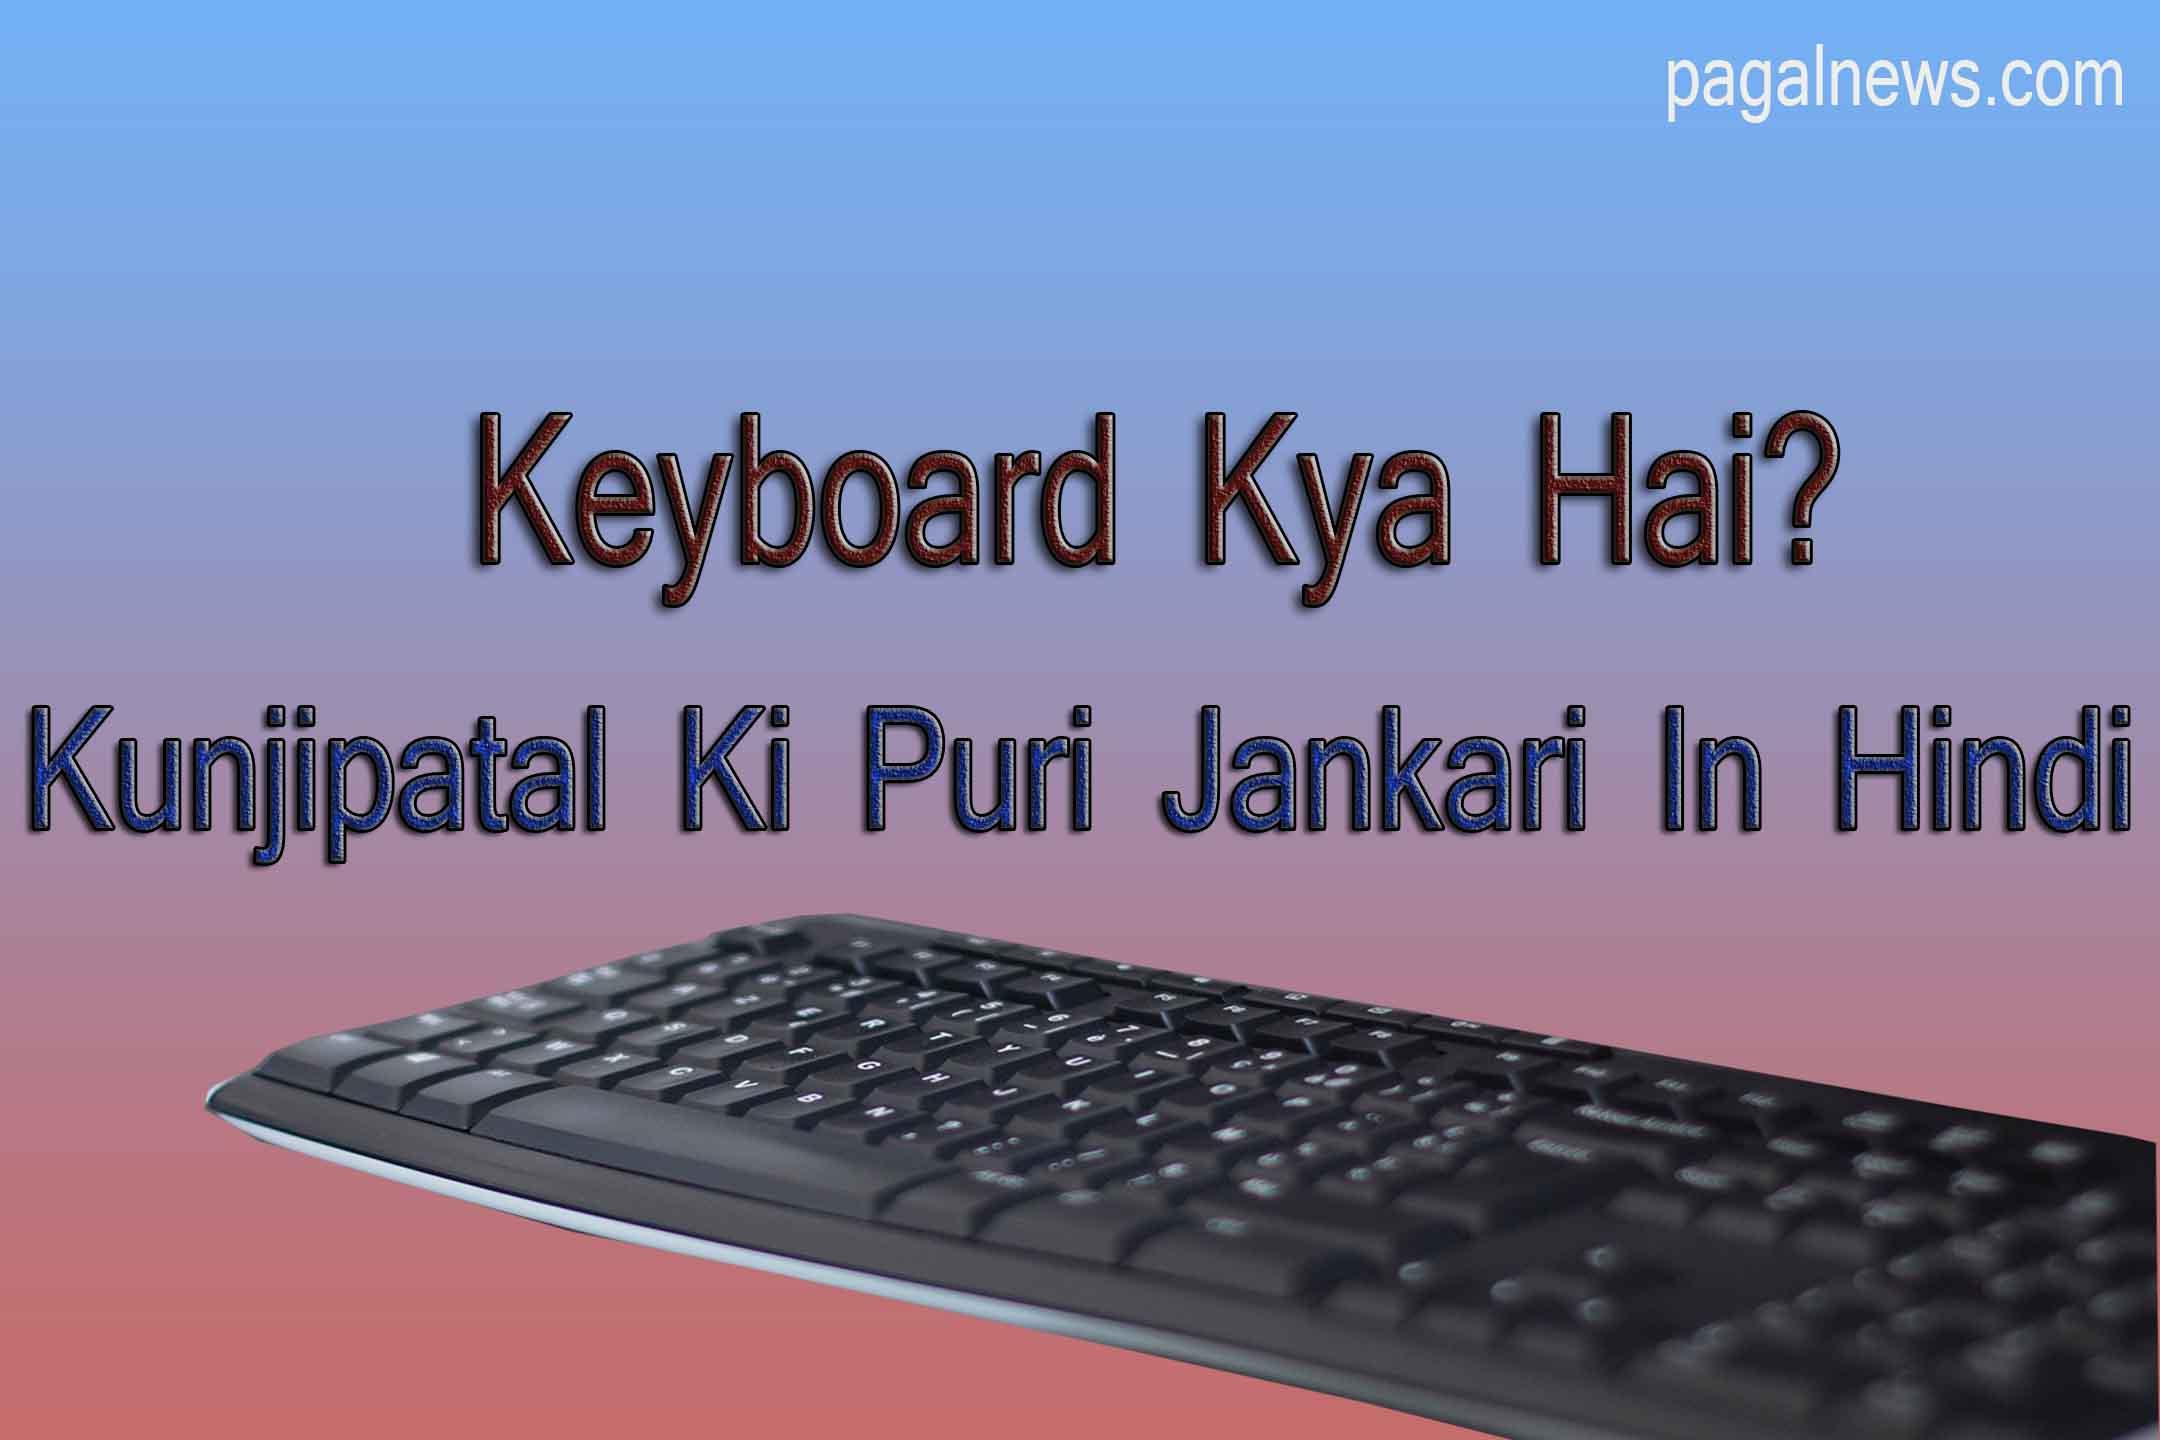 Keyboard Kya Hai Kunjipatal Ki Puri Jankari In Hindi